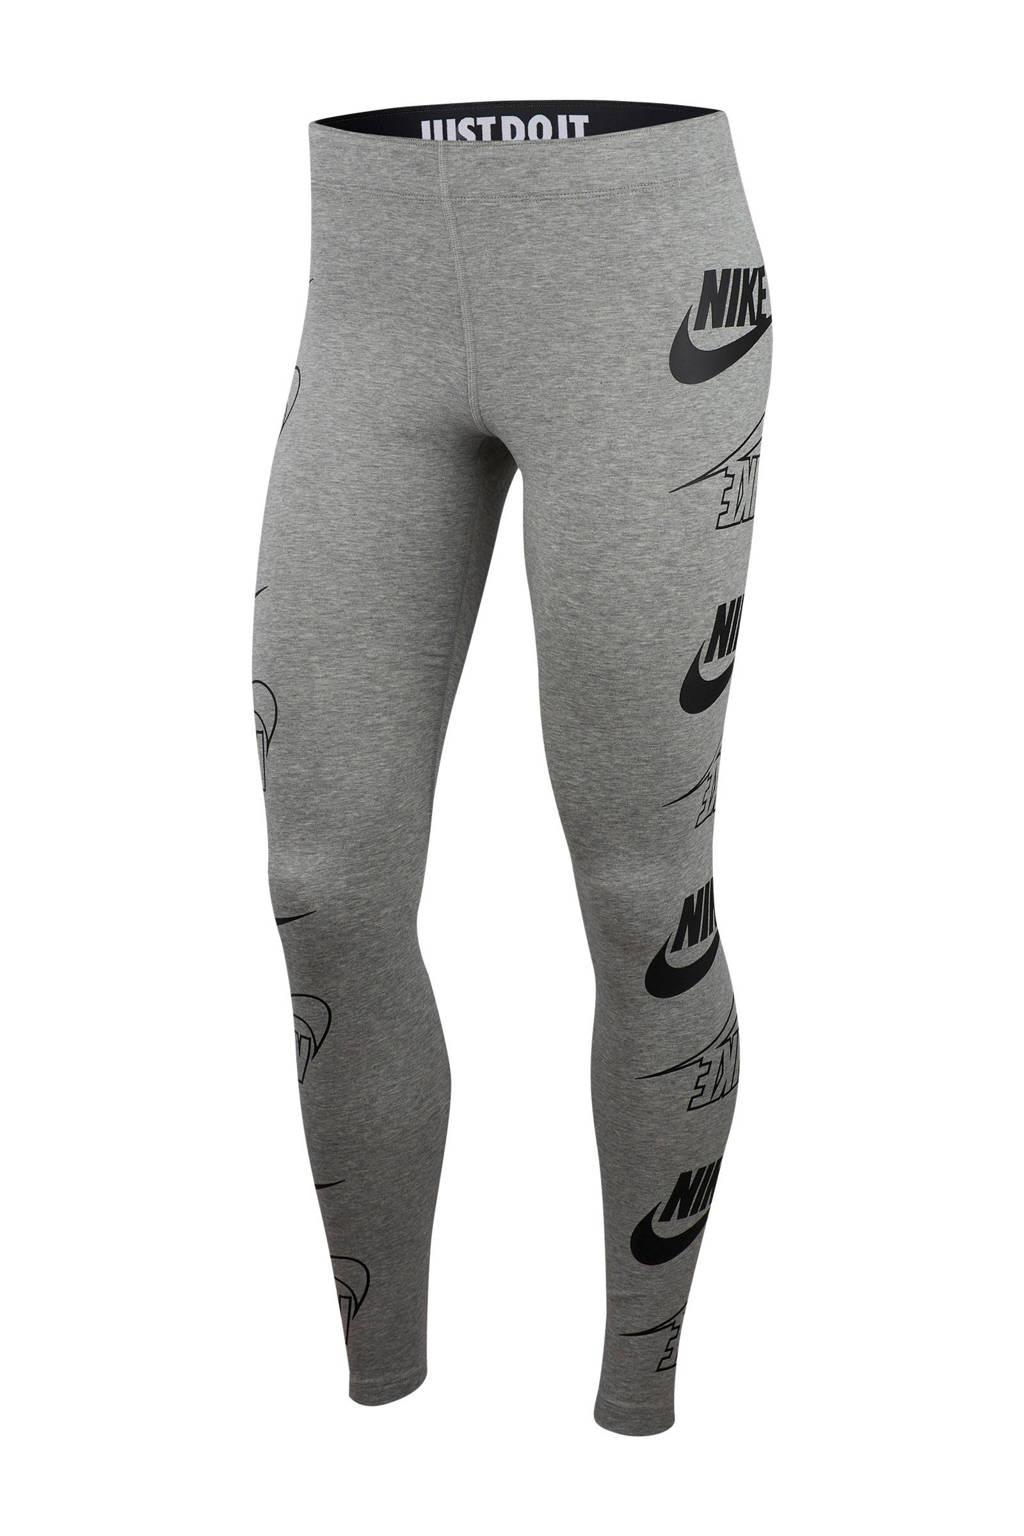 Nike legging grijs melange/zwart, Grijs melange/zwart